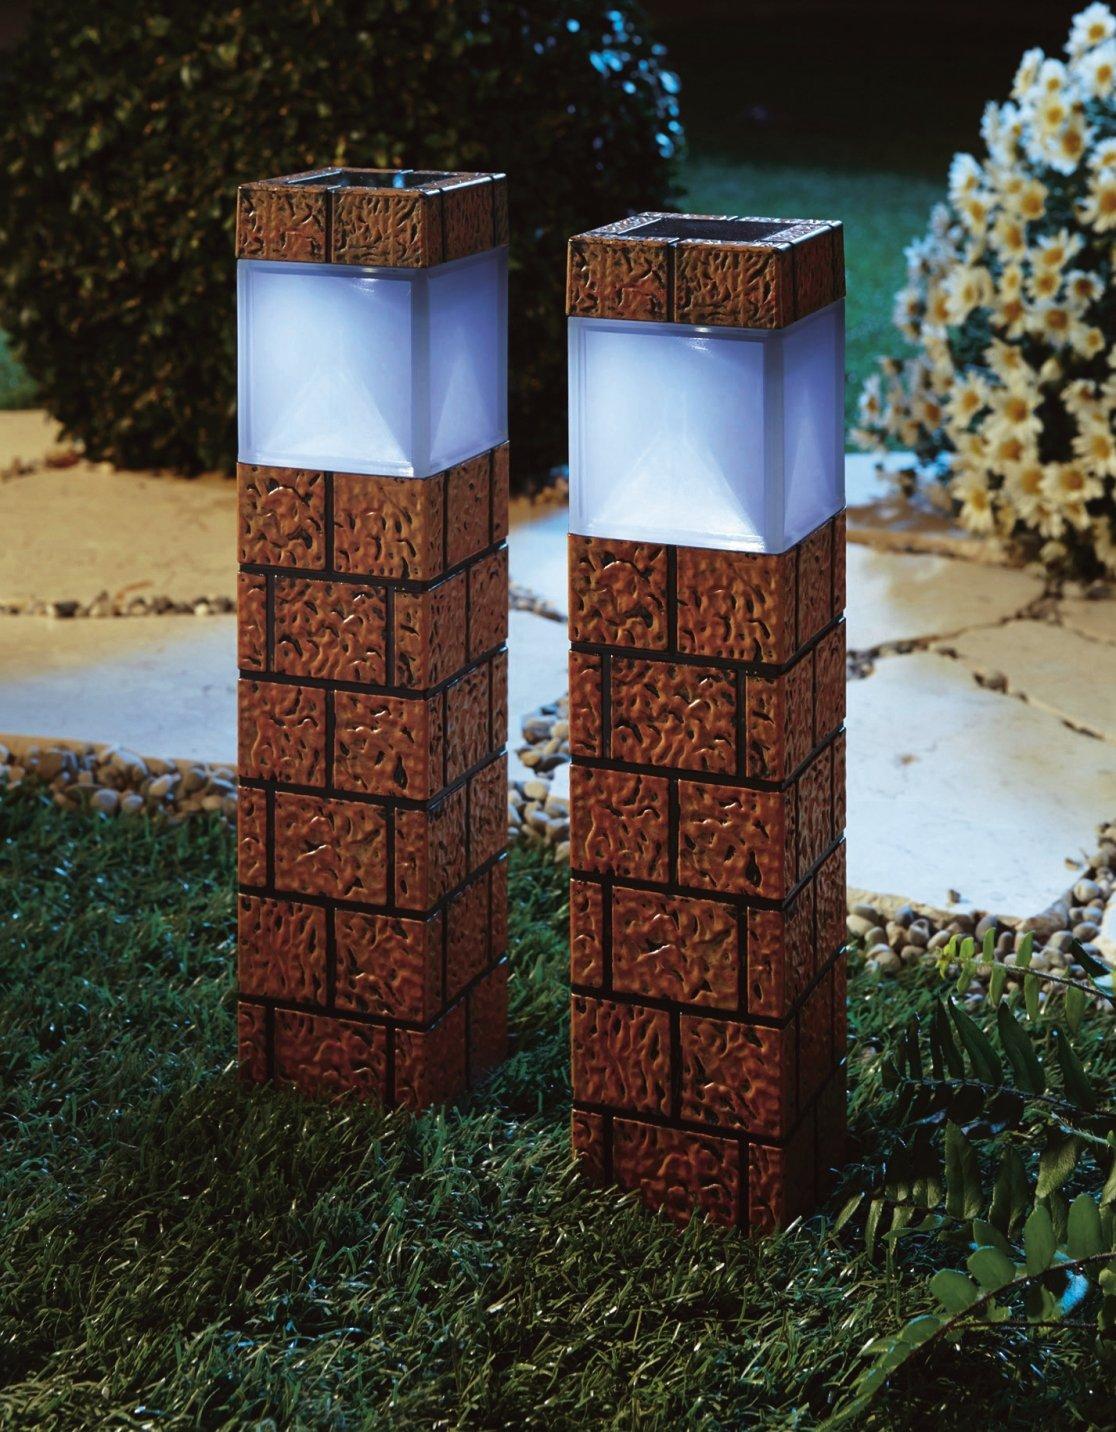 solar leuchte klinker 2er set led gartenbeleuchtung gartenlicht solarlicht ebay. Black Bedroom Furniture Sets. Home Design Ideas